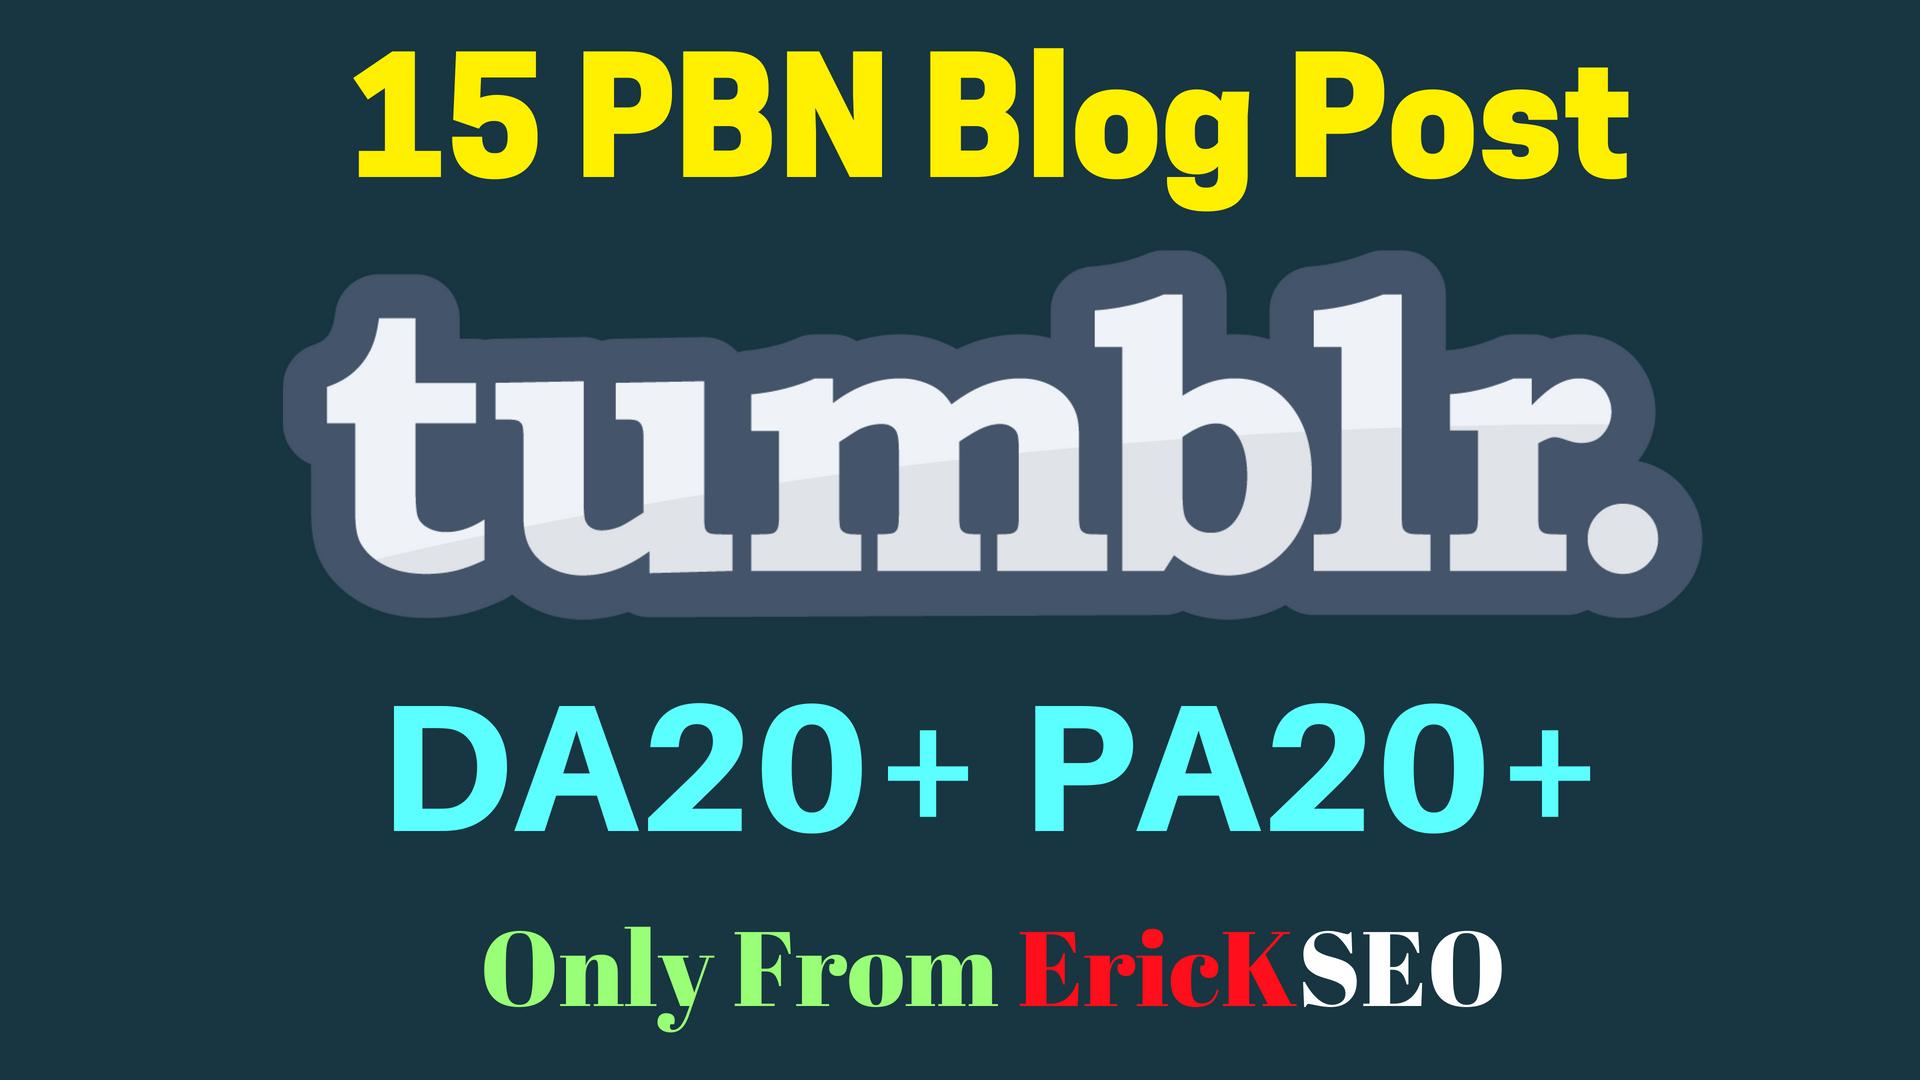 Permanent 15 Tumblr PBN blog posts DA20+ and PA20+